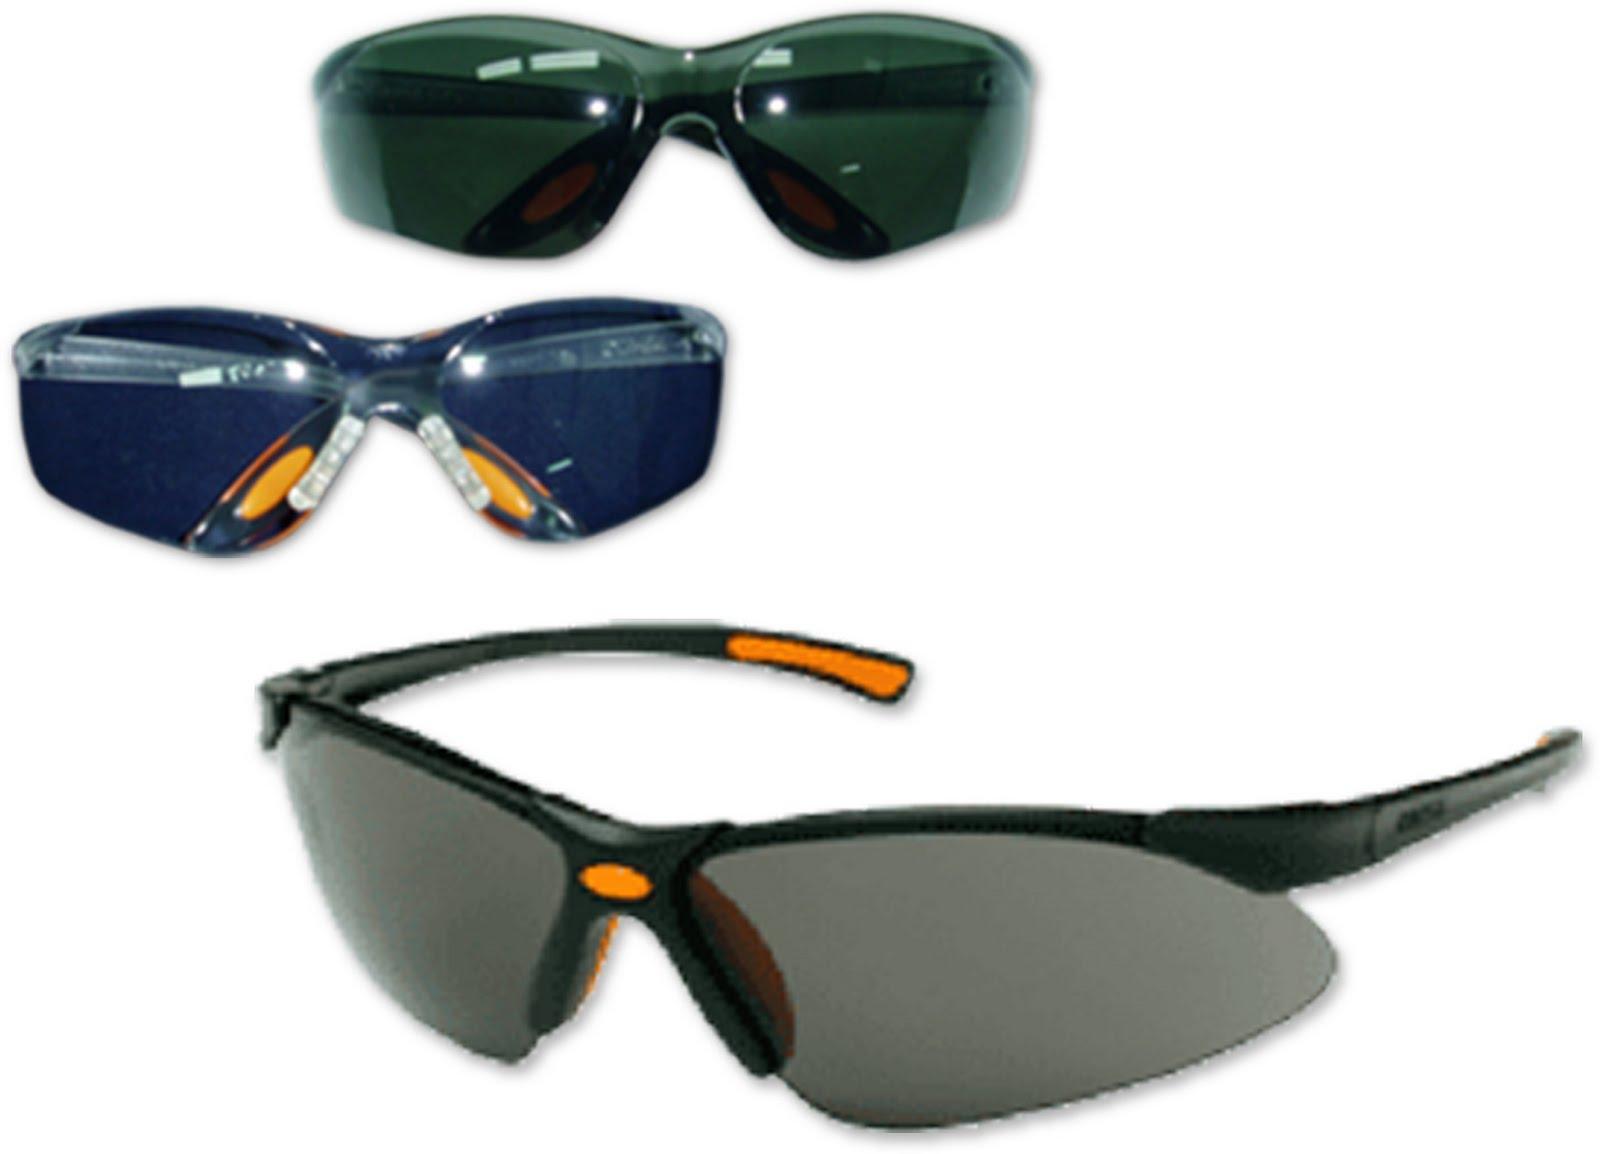 sunglasses official website www tapdance org